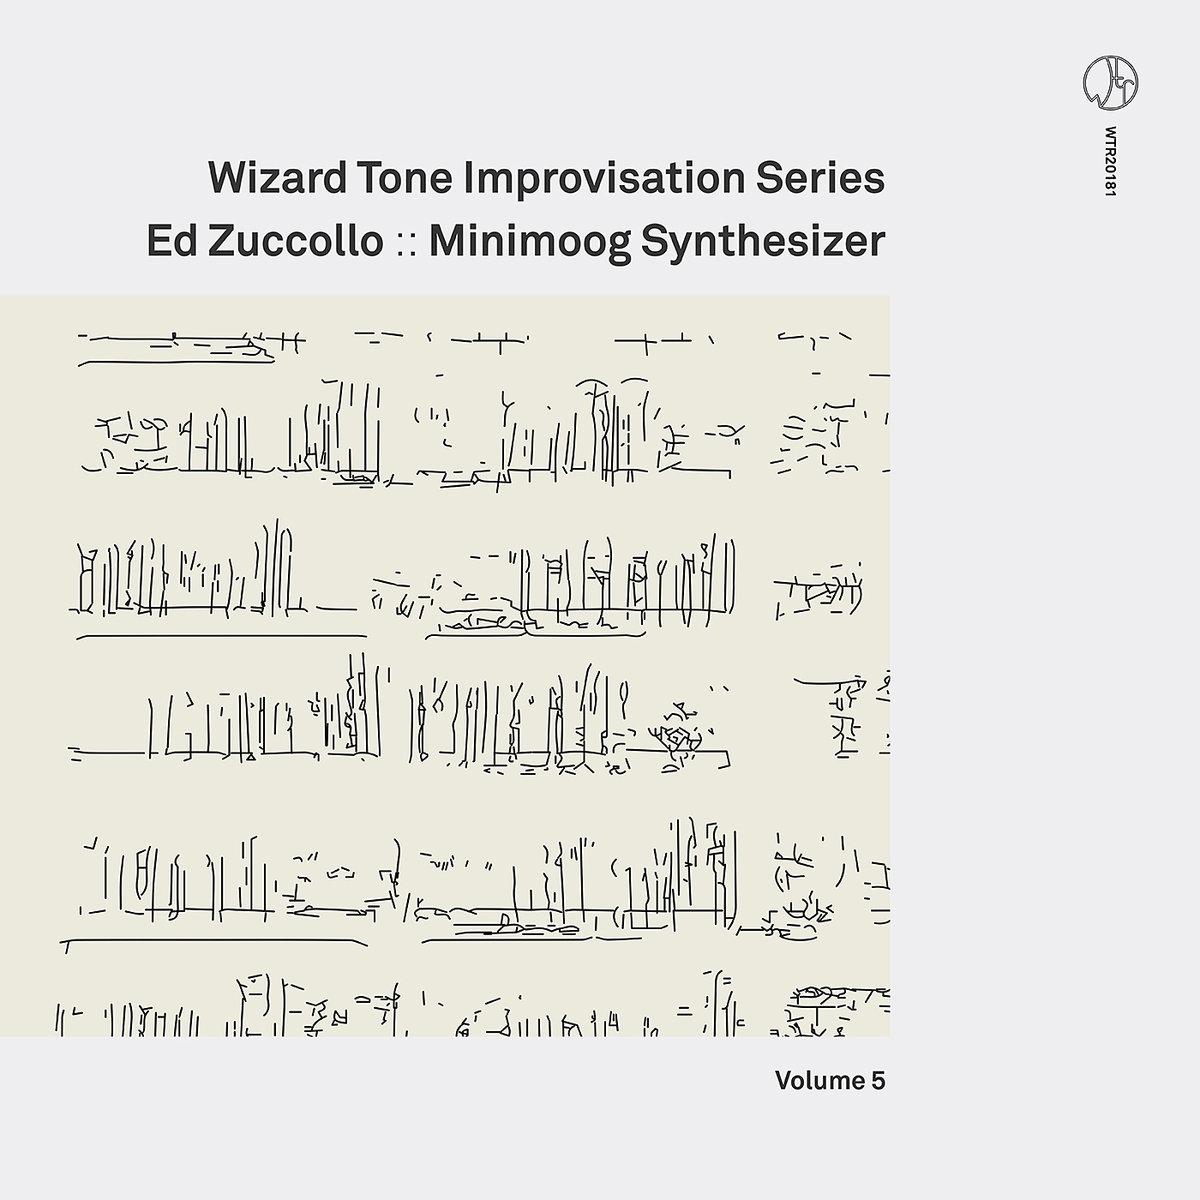 Wizard Tone Improvisation Series Volume 5: Ed Zuccollo [Recorded, Mixed & Mastered (JB, JP & Audrey Newcombe), Produced (AP), WTR]